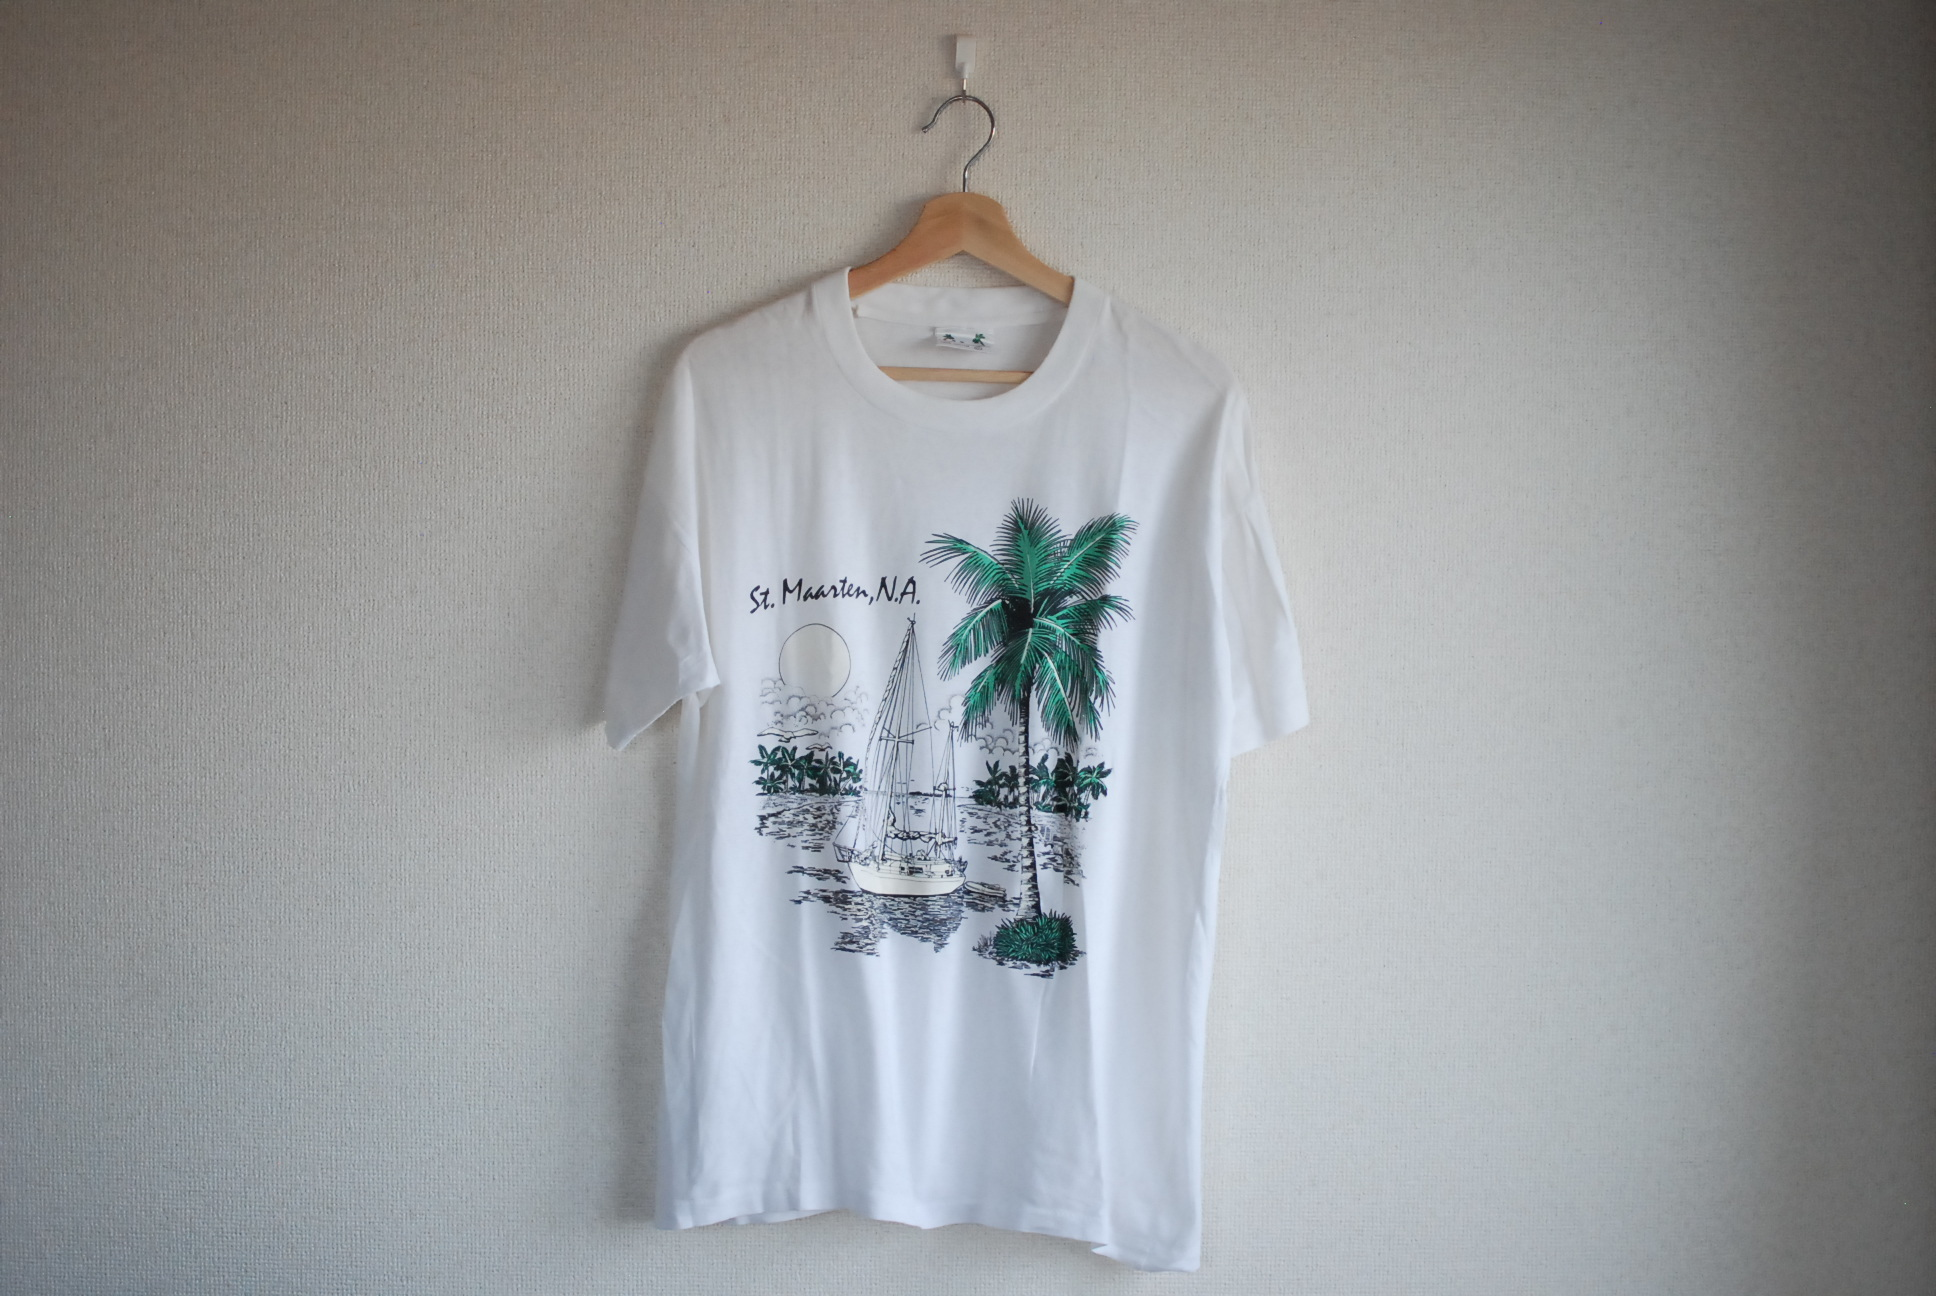 【UNISEX】VINTAGE St.Maaten T-shirt